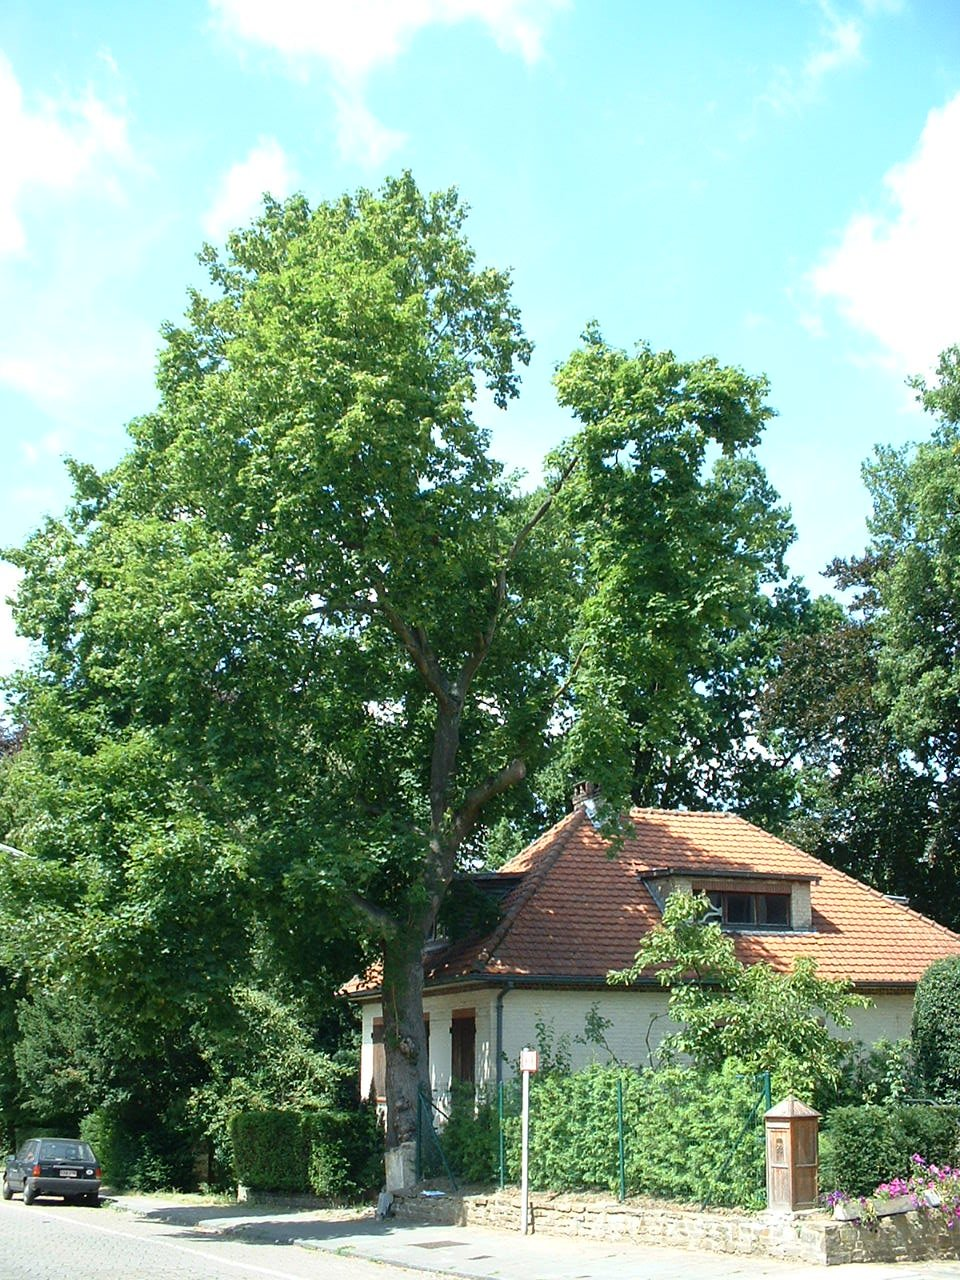 Noorse esdoorn – Watermaal-Bosvoorde, Léopold Wienerlaan, 90 –  18 Juli 2002